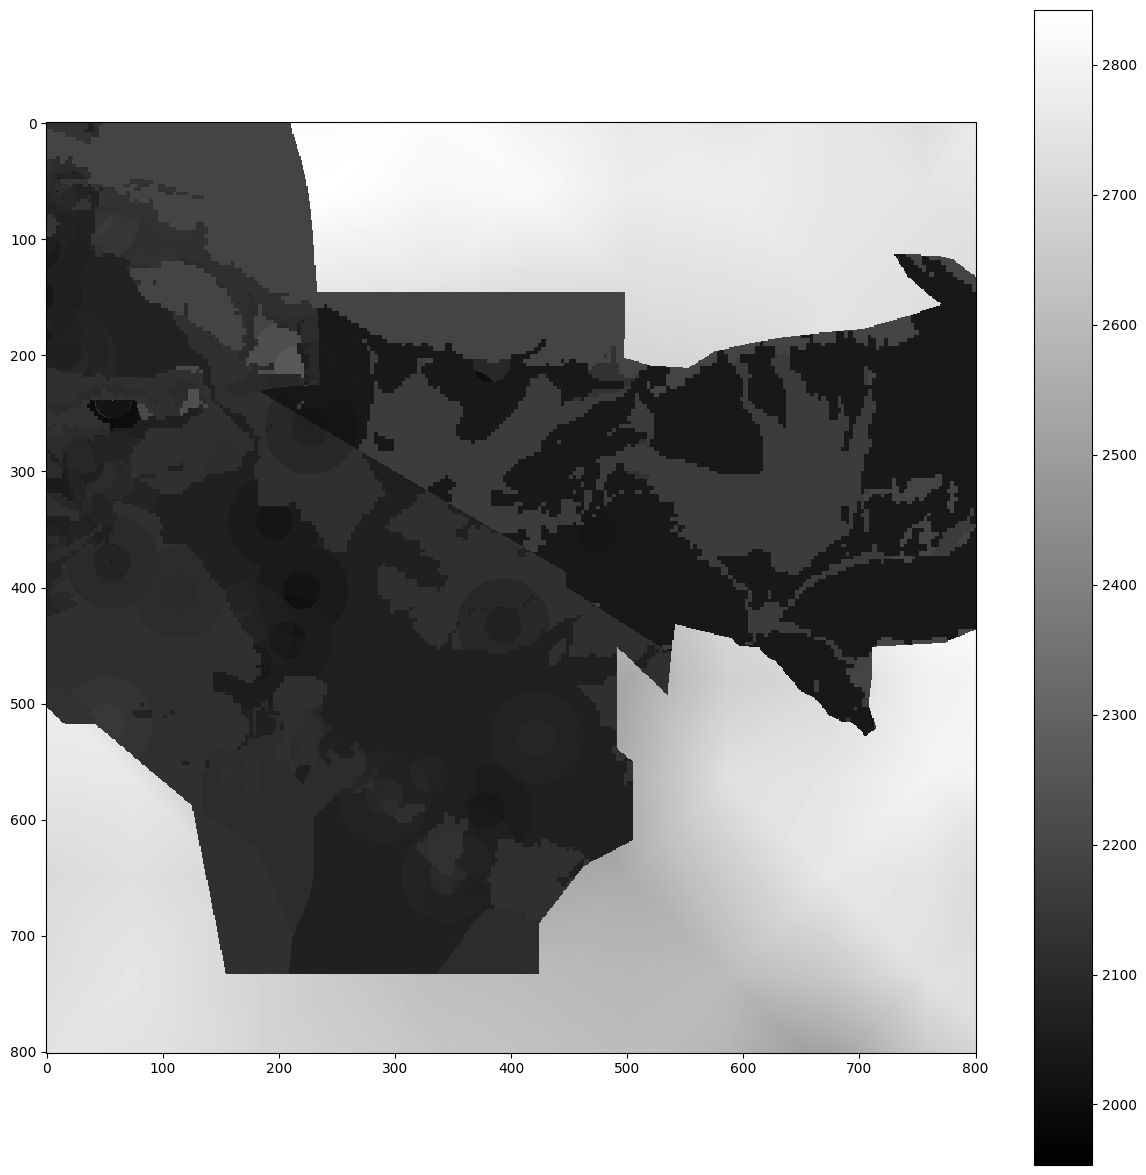 bench/seismic/wp/la_habra/meshes/velocity_model/plots/rho_25.png